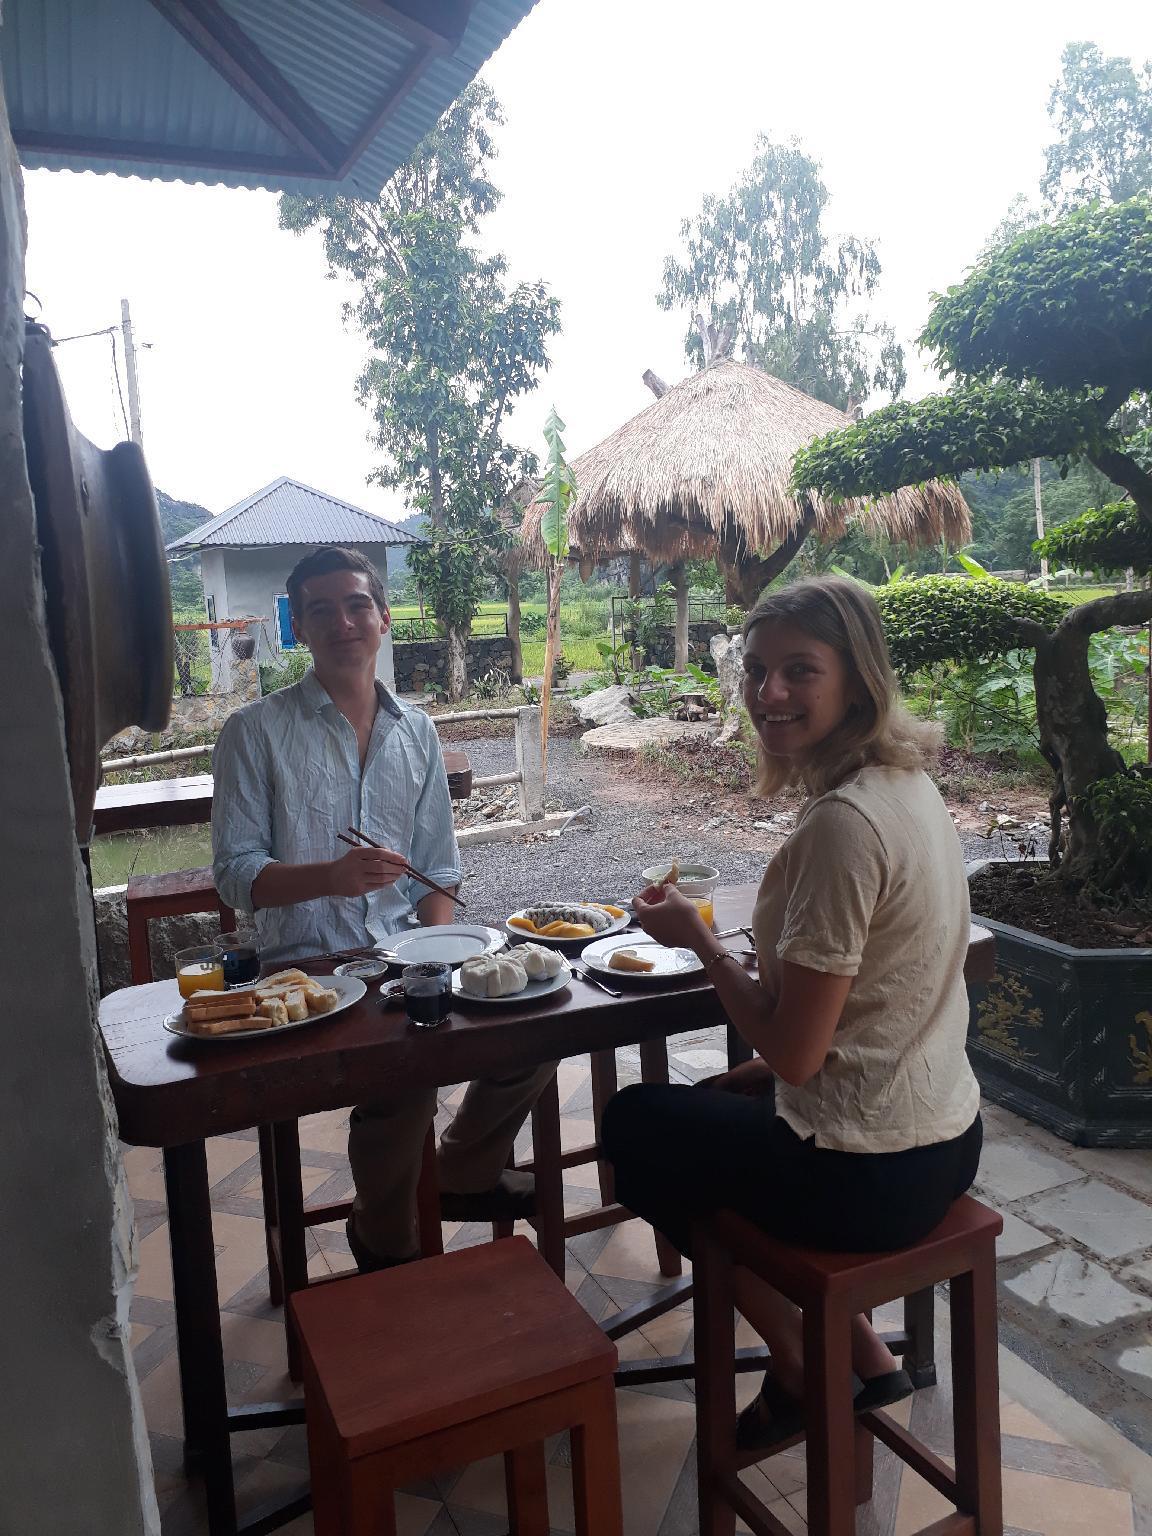 Rustic Houses Tam Coc, Hoa Lư